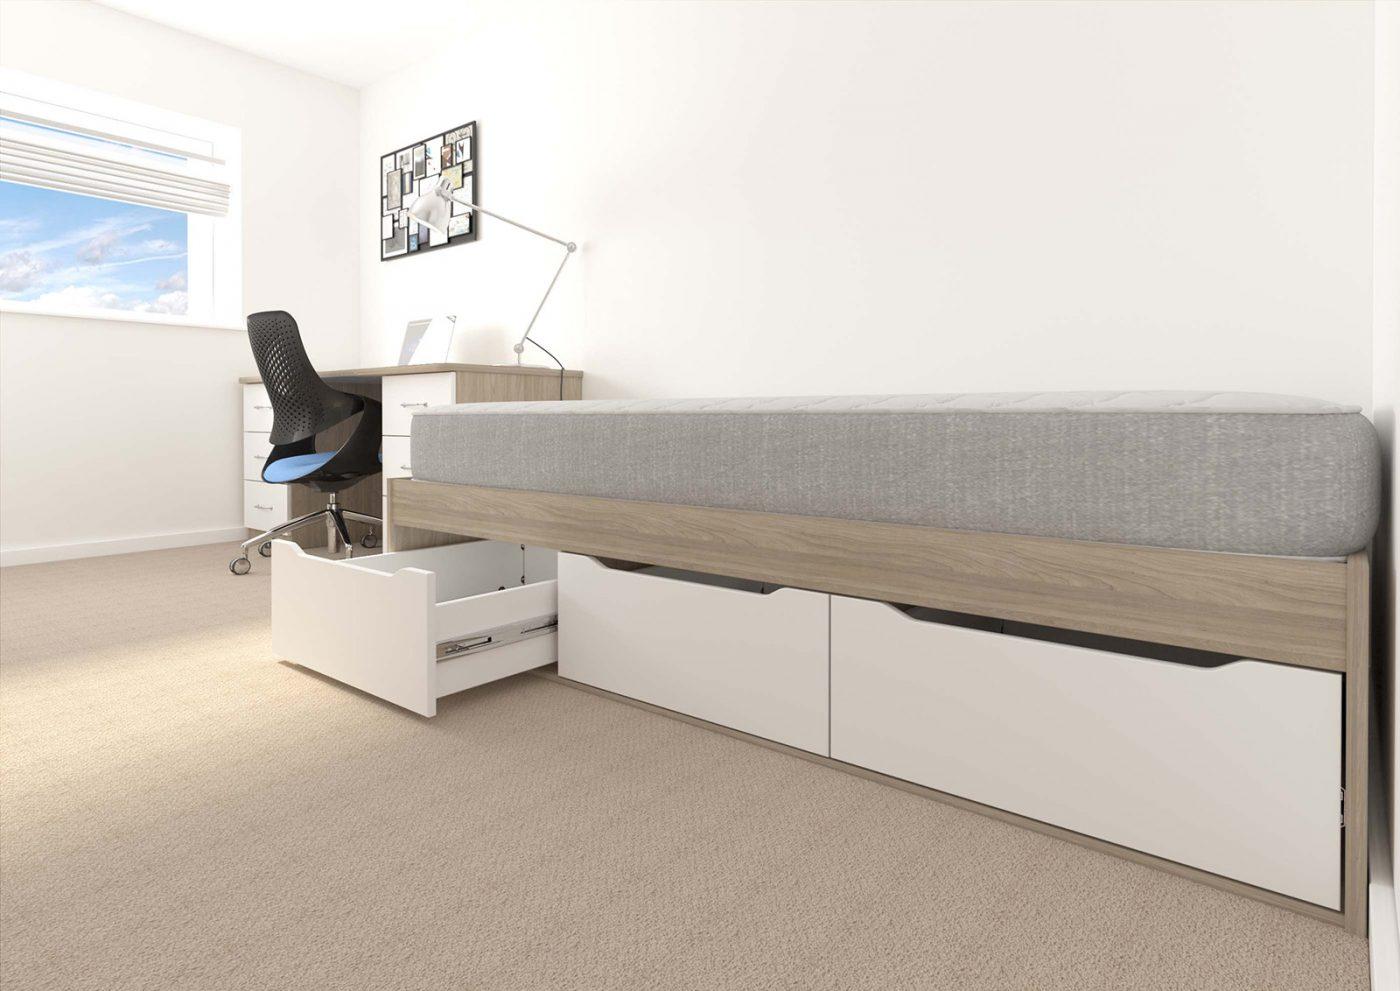 student accommodation furniture, bedroom furniture, residential furniture, under bed storage